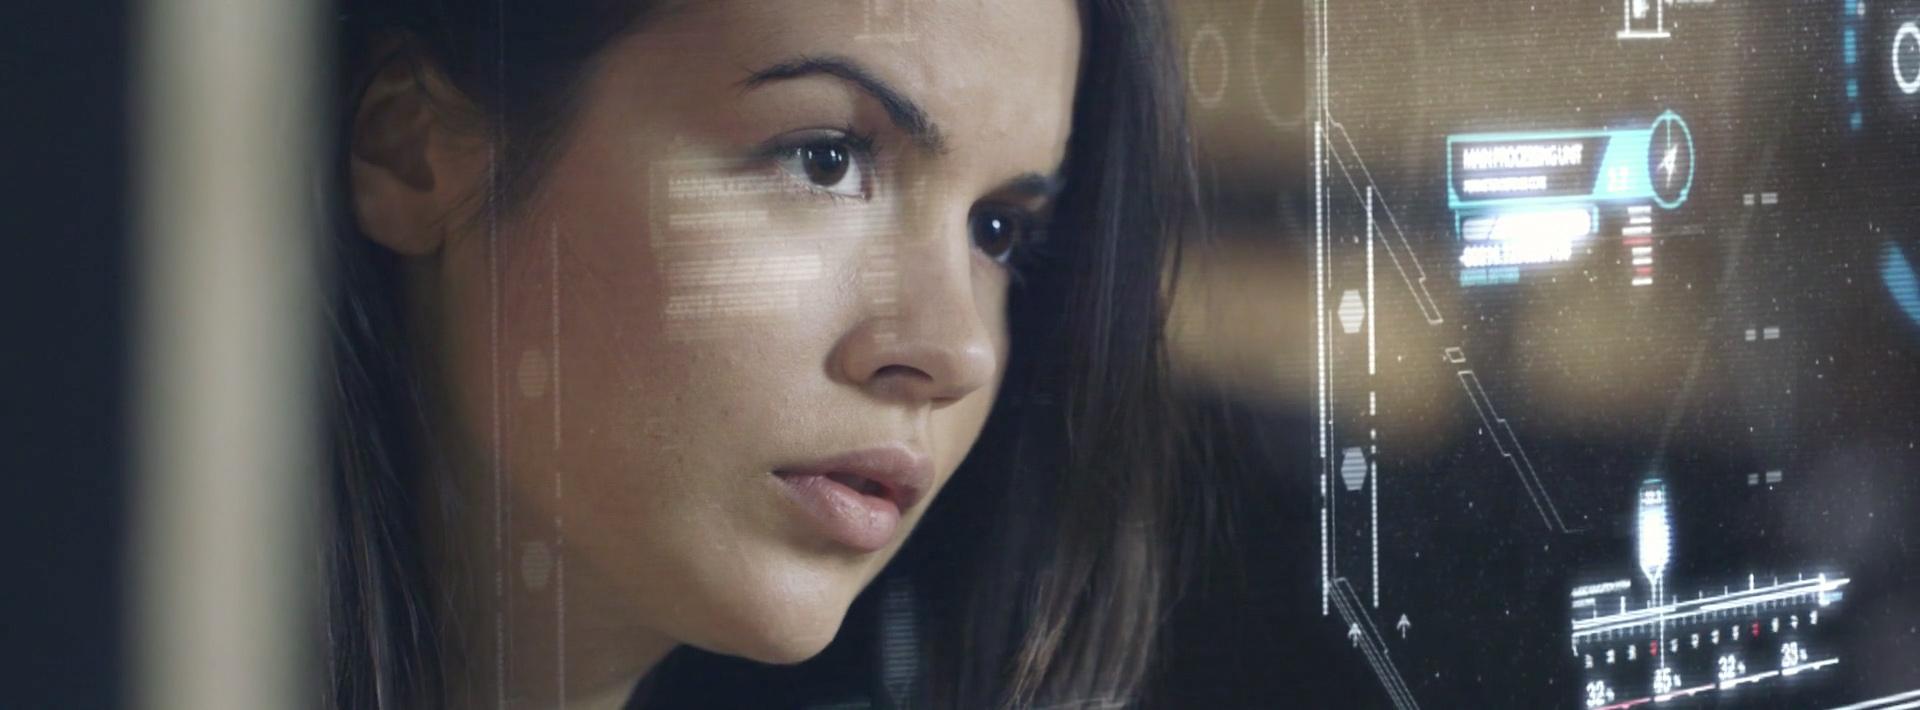 beautifully-shot-sci-fi-short-film-beyond-13.jpg